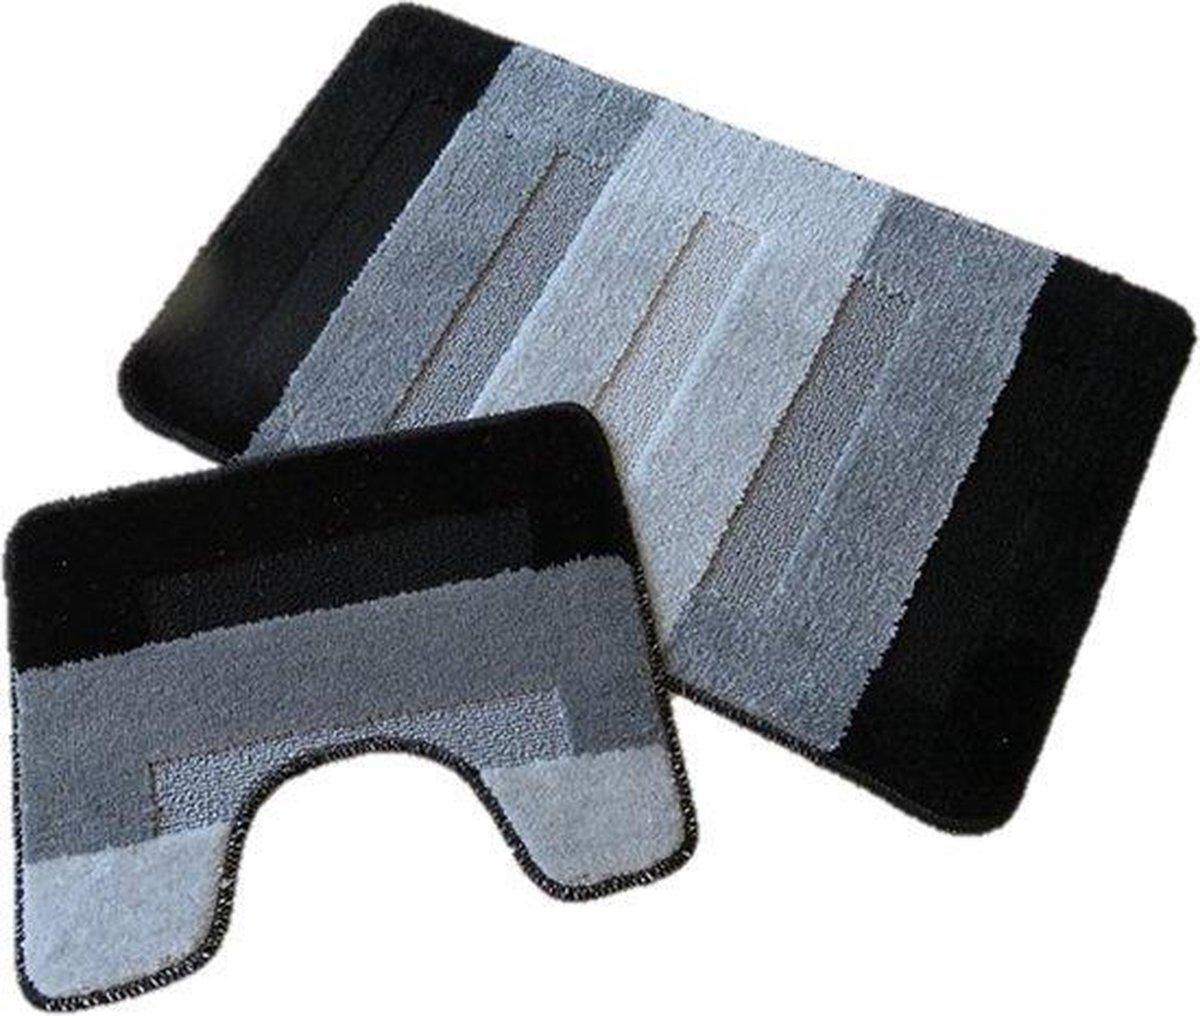 Ikado Badmat set - Zwart/grijs - 60 x 100 cm + 50 x 60 cm